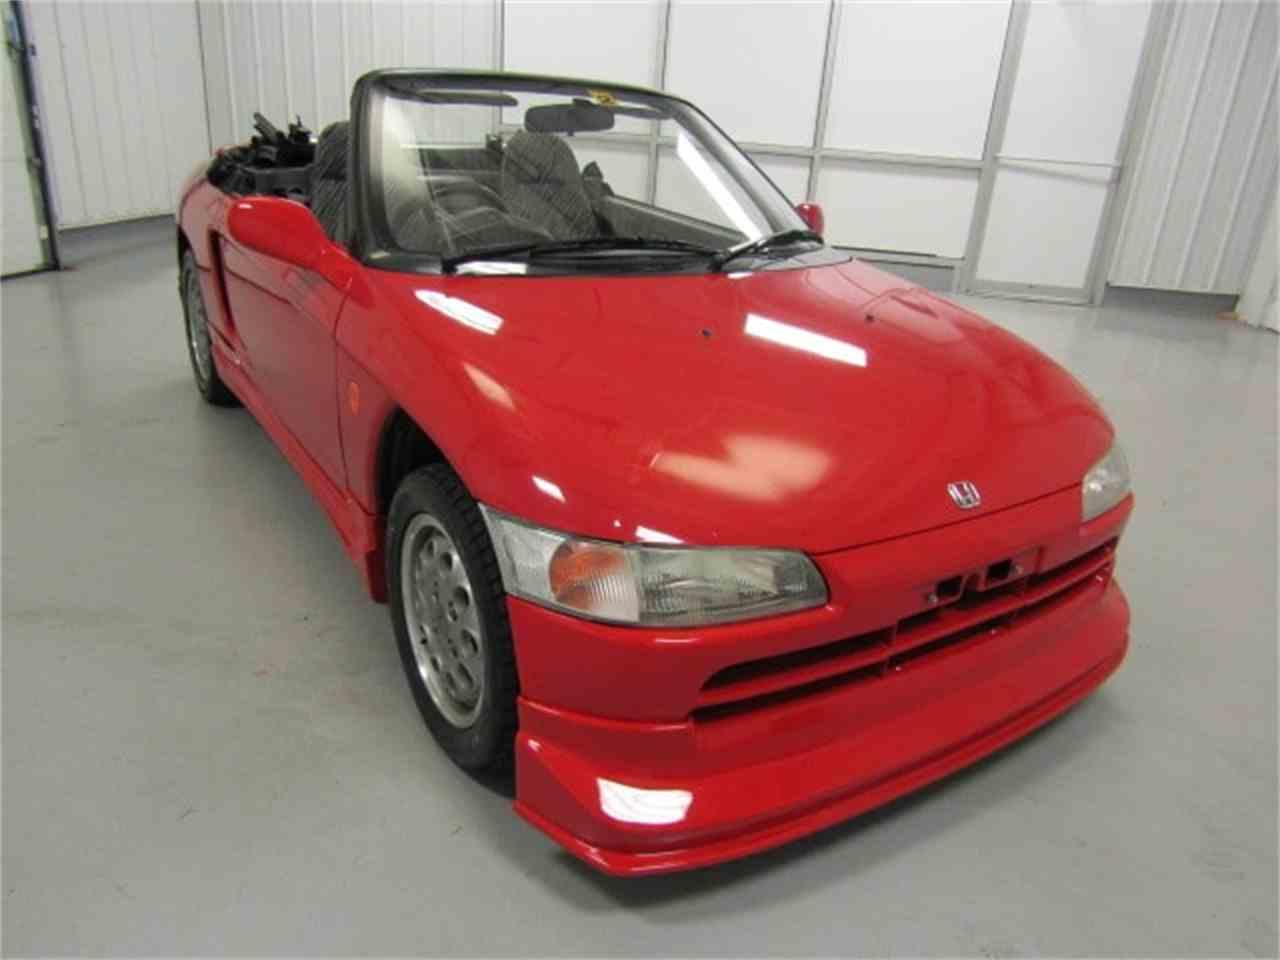 Large Picture of '91 Honda Beat located in Virginia - $6,999.00 - JL83